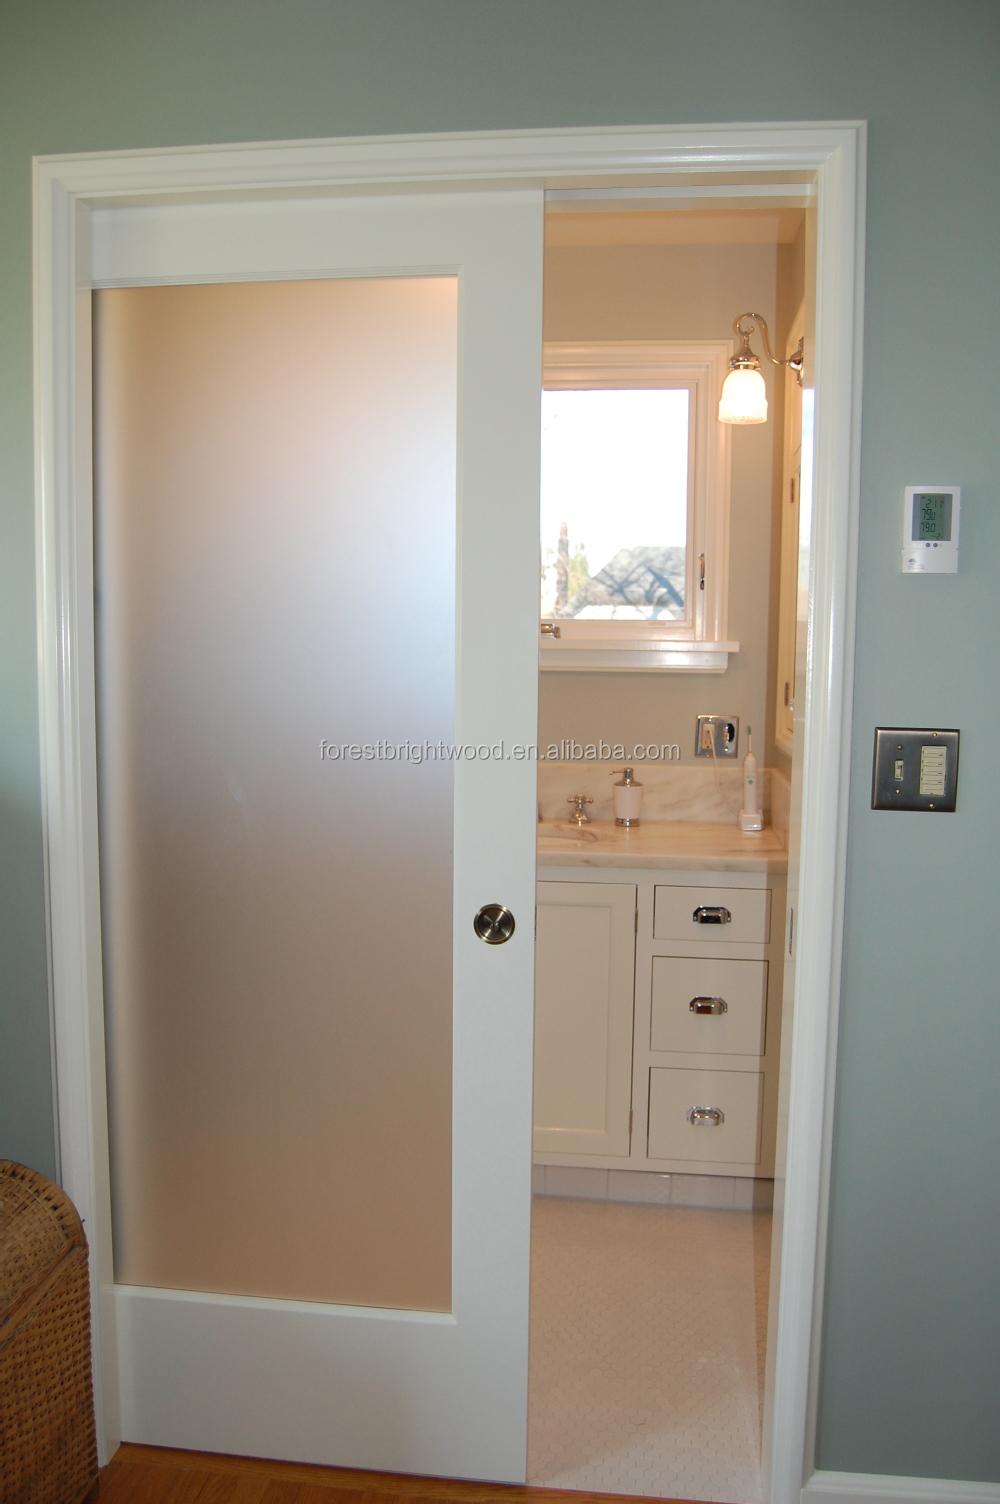 Frosted Glass White Pocket Door Design For Bathroom Buy